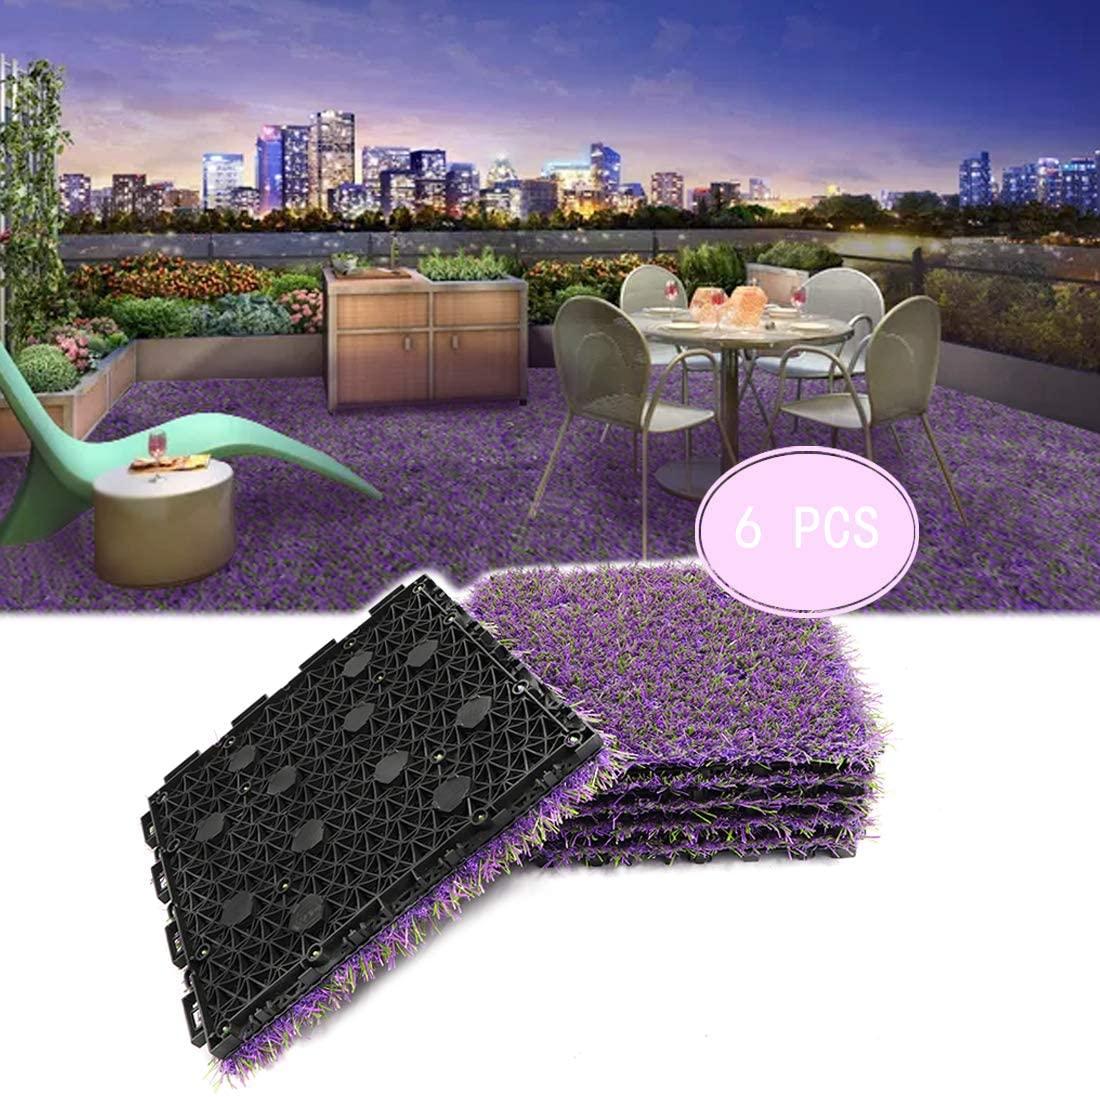 PROGOAL Artificial Lavender Turf Tile Fake Lavender Flooring Mat Interlocking Self-draining 12''x12'', 1.7'' Height (1.38in Grass)